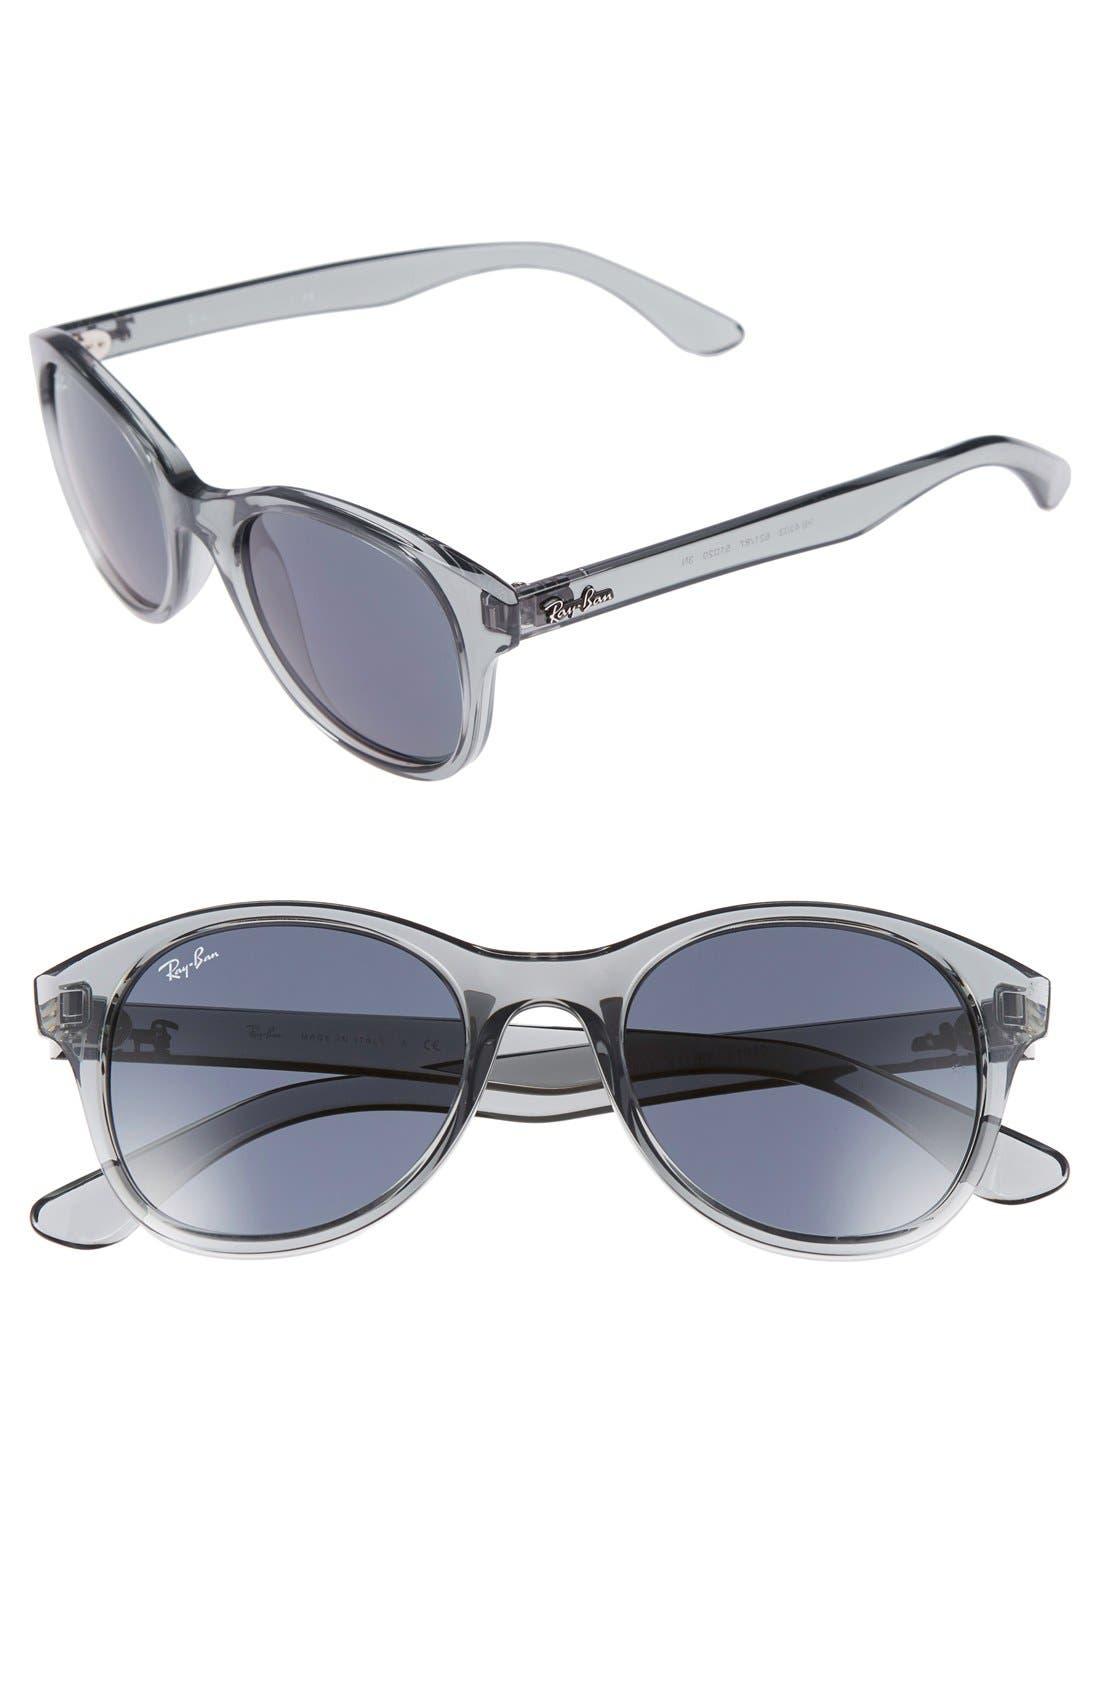 Main Image - Ray-Ban 'Highstreet' 51mm Sunglasses